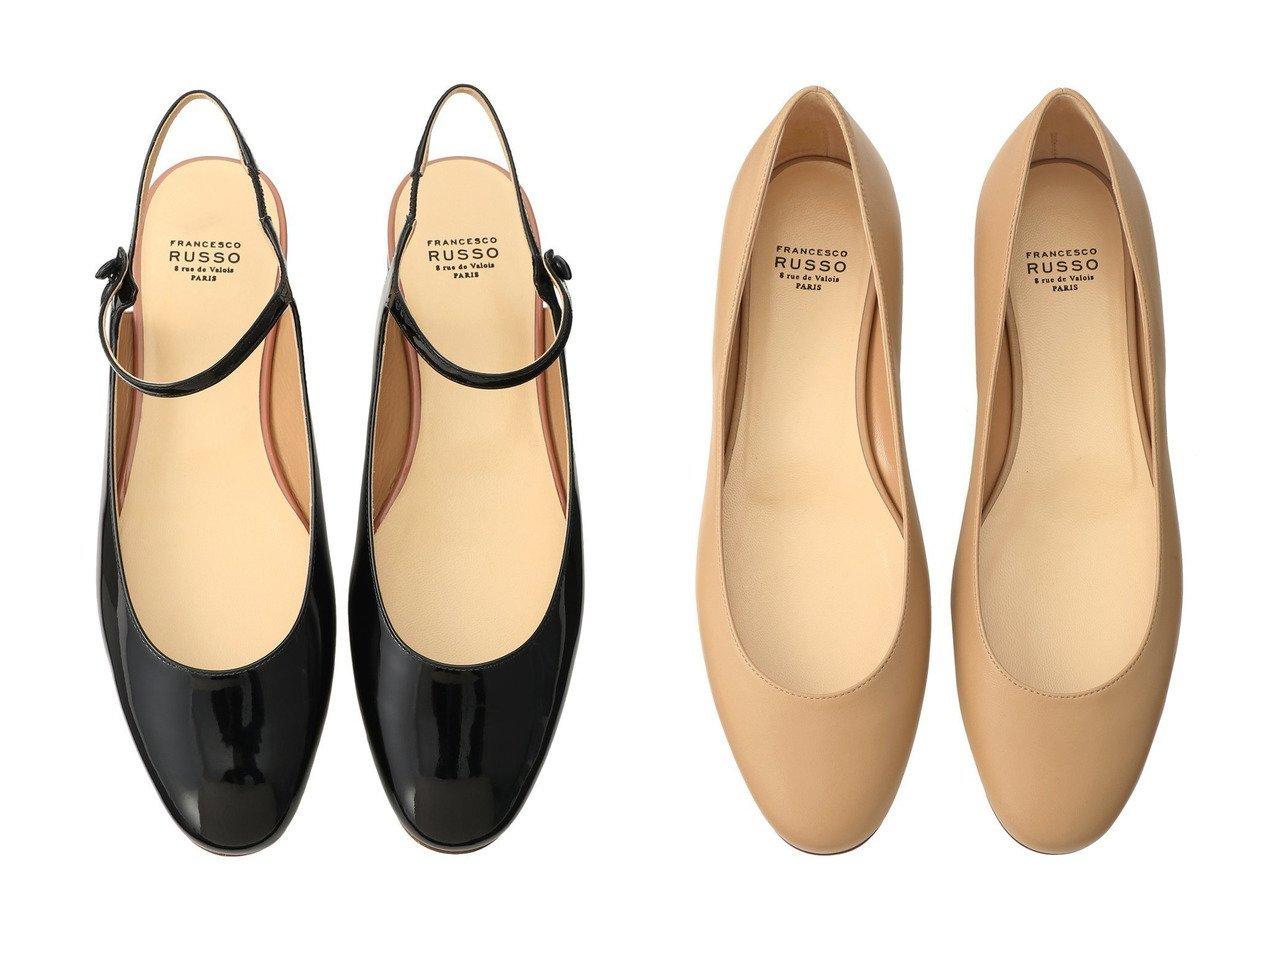 【FRANCESCO RUSSO/フランセスコルッソ 】のストラップフラットシューズ&フラットシューズ シューズ・靴のおすすめ!人気、トレンド・レディースファッションの通販 おすすめで人気の流行・トレンド、ファッションの通販商品 メンズファッション・キッズファッション・インテリア・家具・レディースファッション・服の通販 founy(ファニー) https://founy.com/ ファッション Fashion レディースファッション WOMEN 2021年 2021 2021 春夏 S/S SS Spring/Summer 2021 S/S 春夏 SS Spring/Summer サンダル シェイプ シューズ ソックス フェミニン フラット ラップ 春 Spring |ID:crp329100000015318